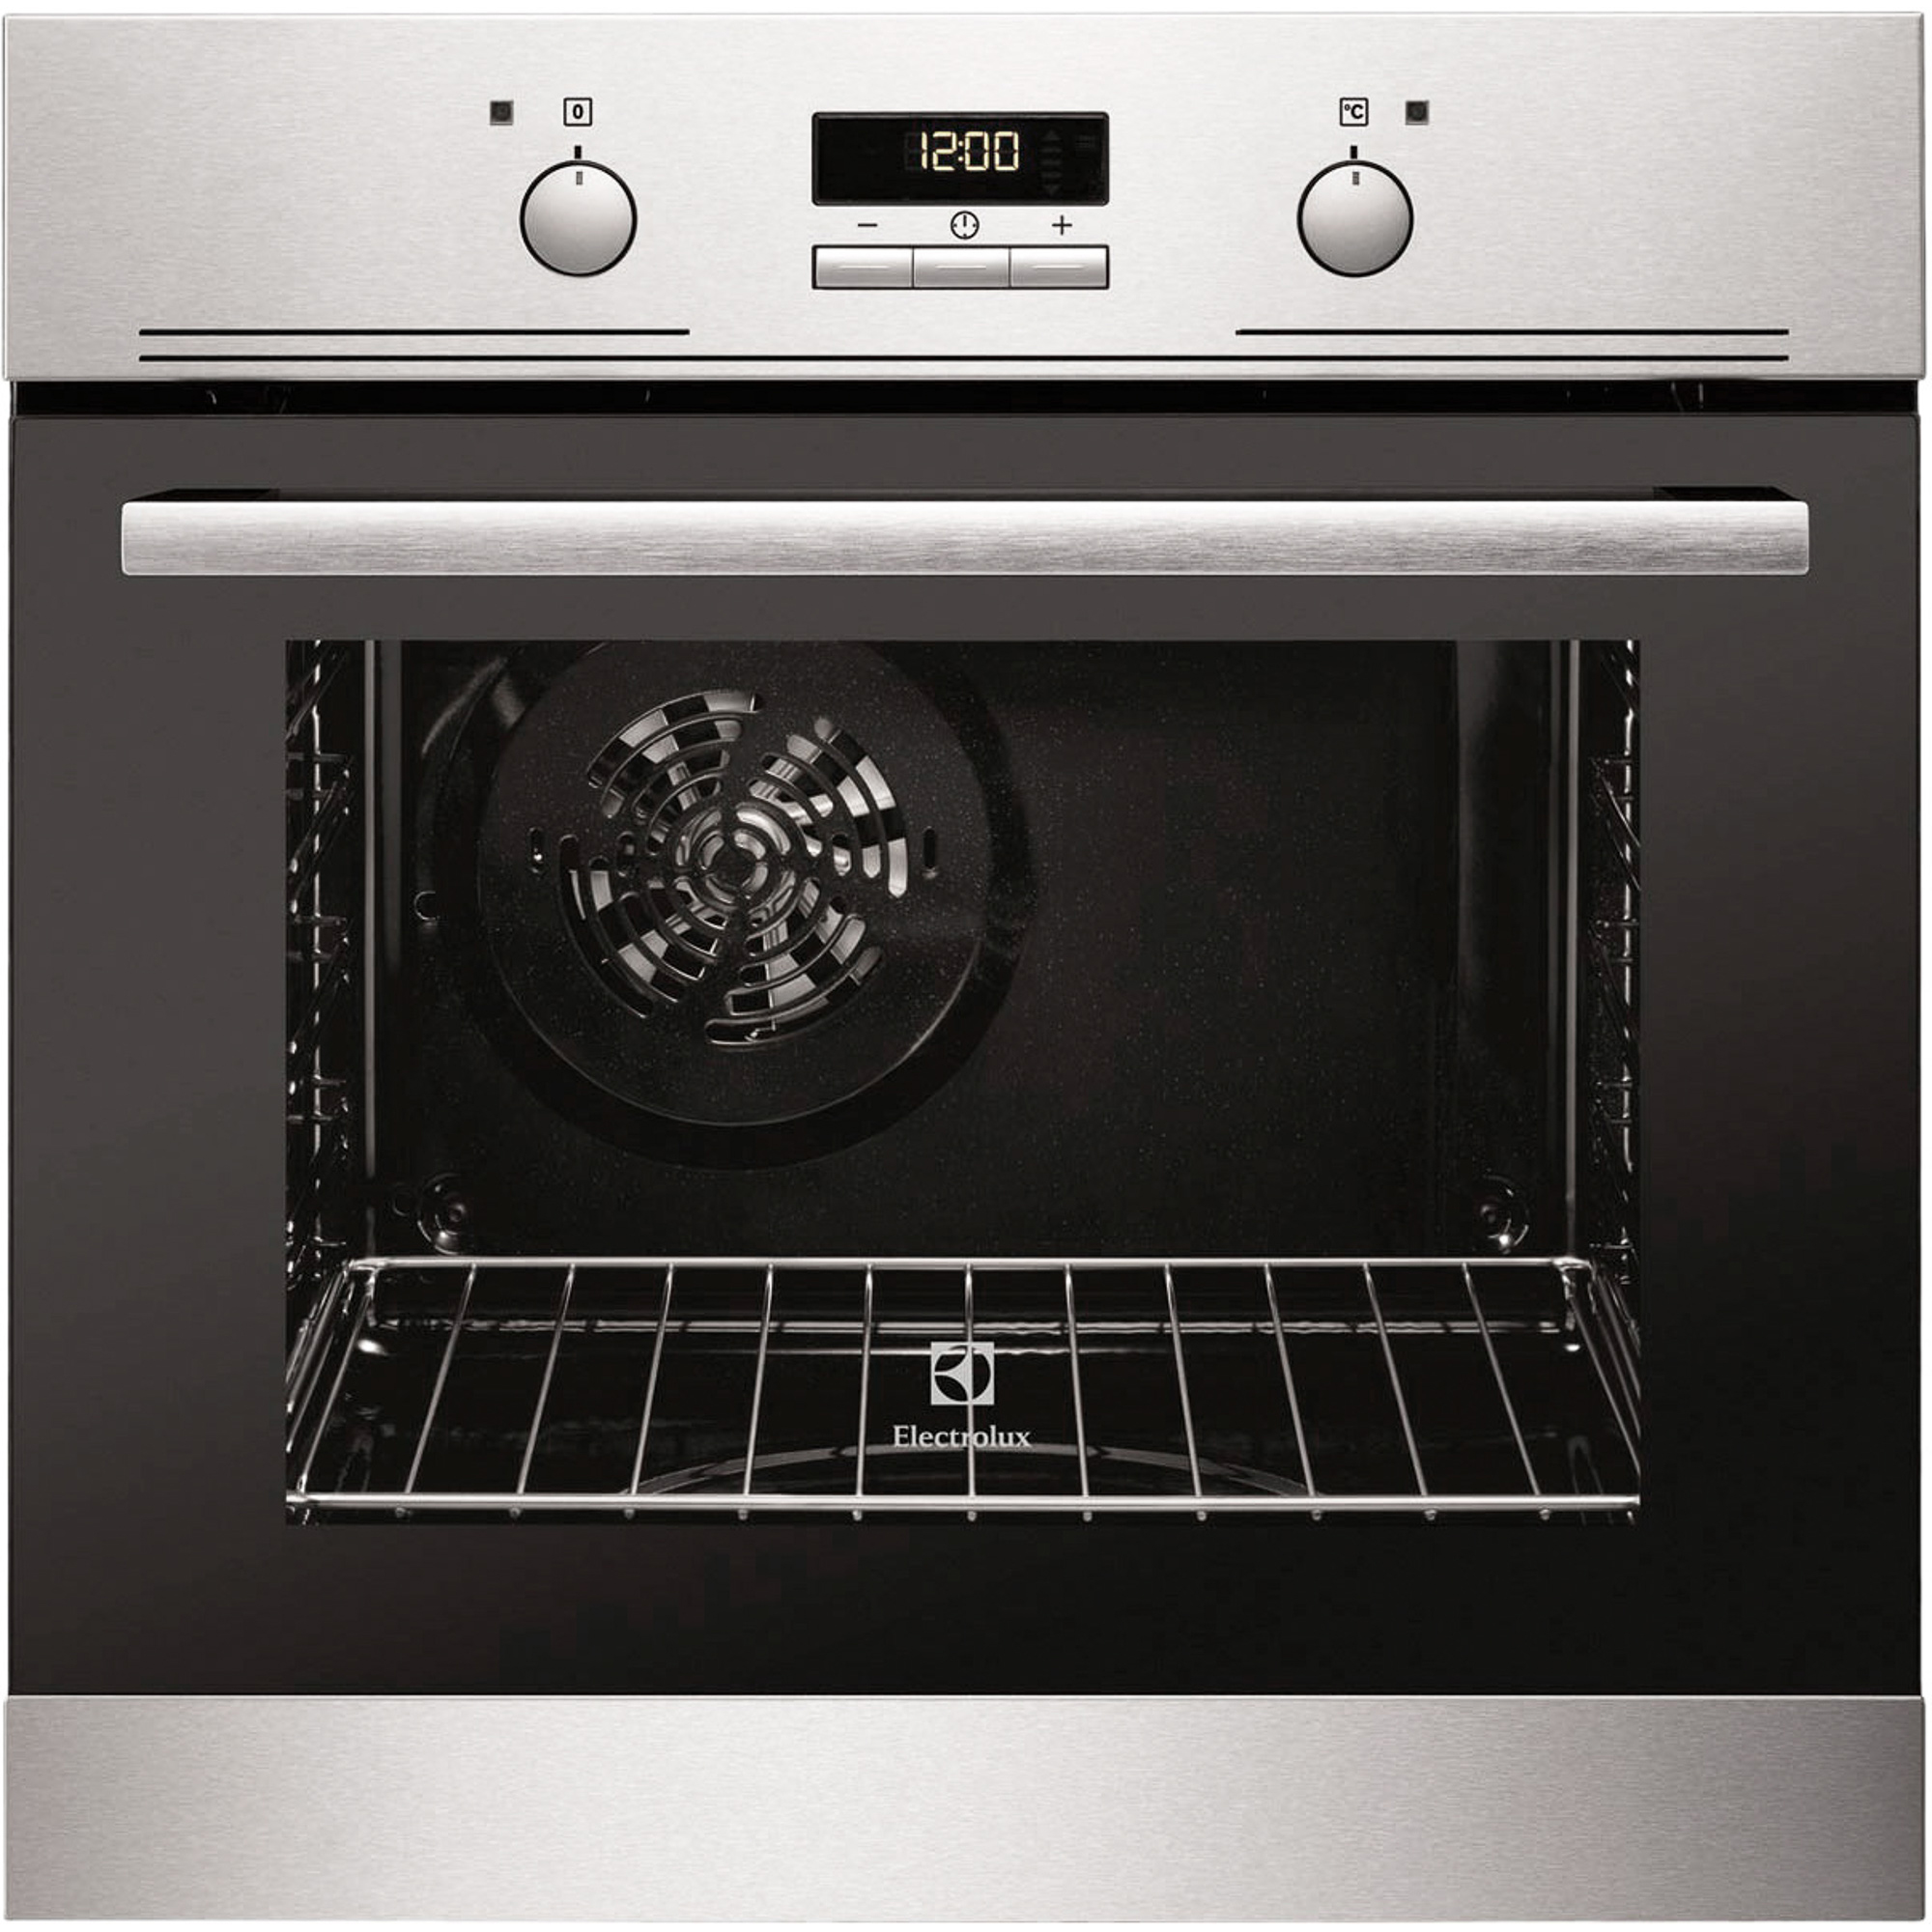 Духовой шкаф Electrolux OPEB 4230 X BI Oven фото